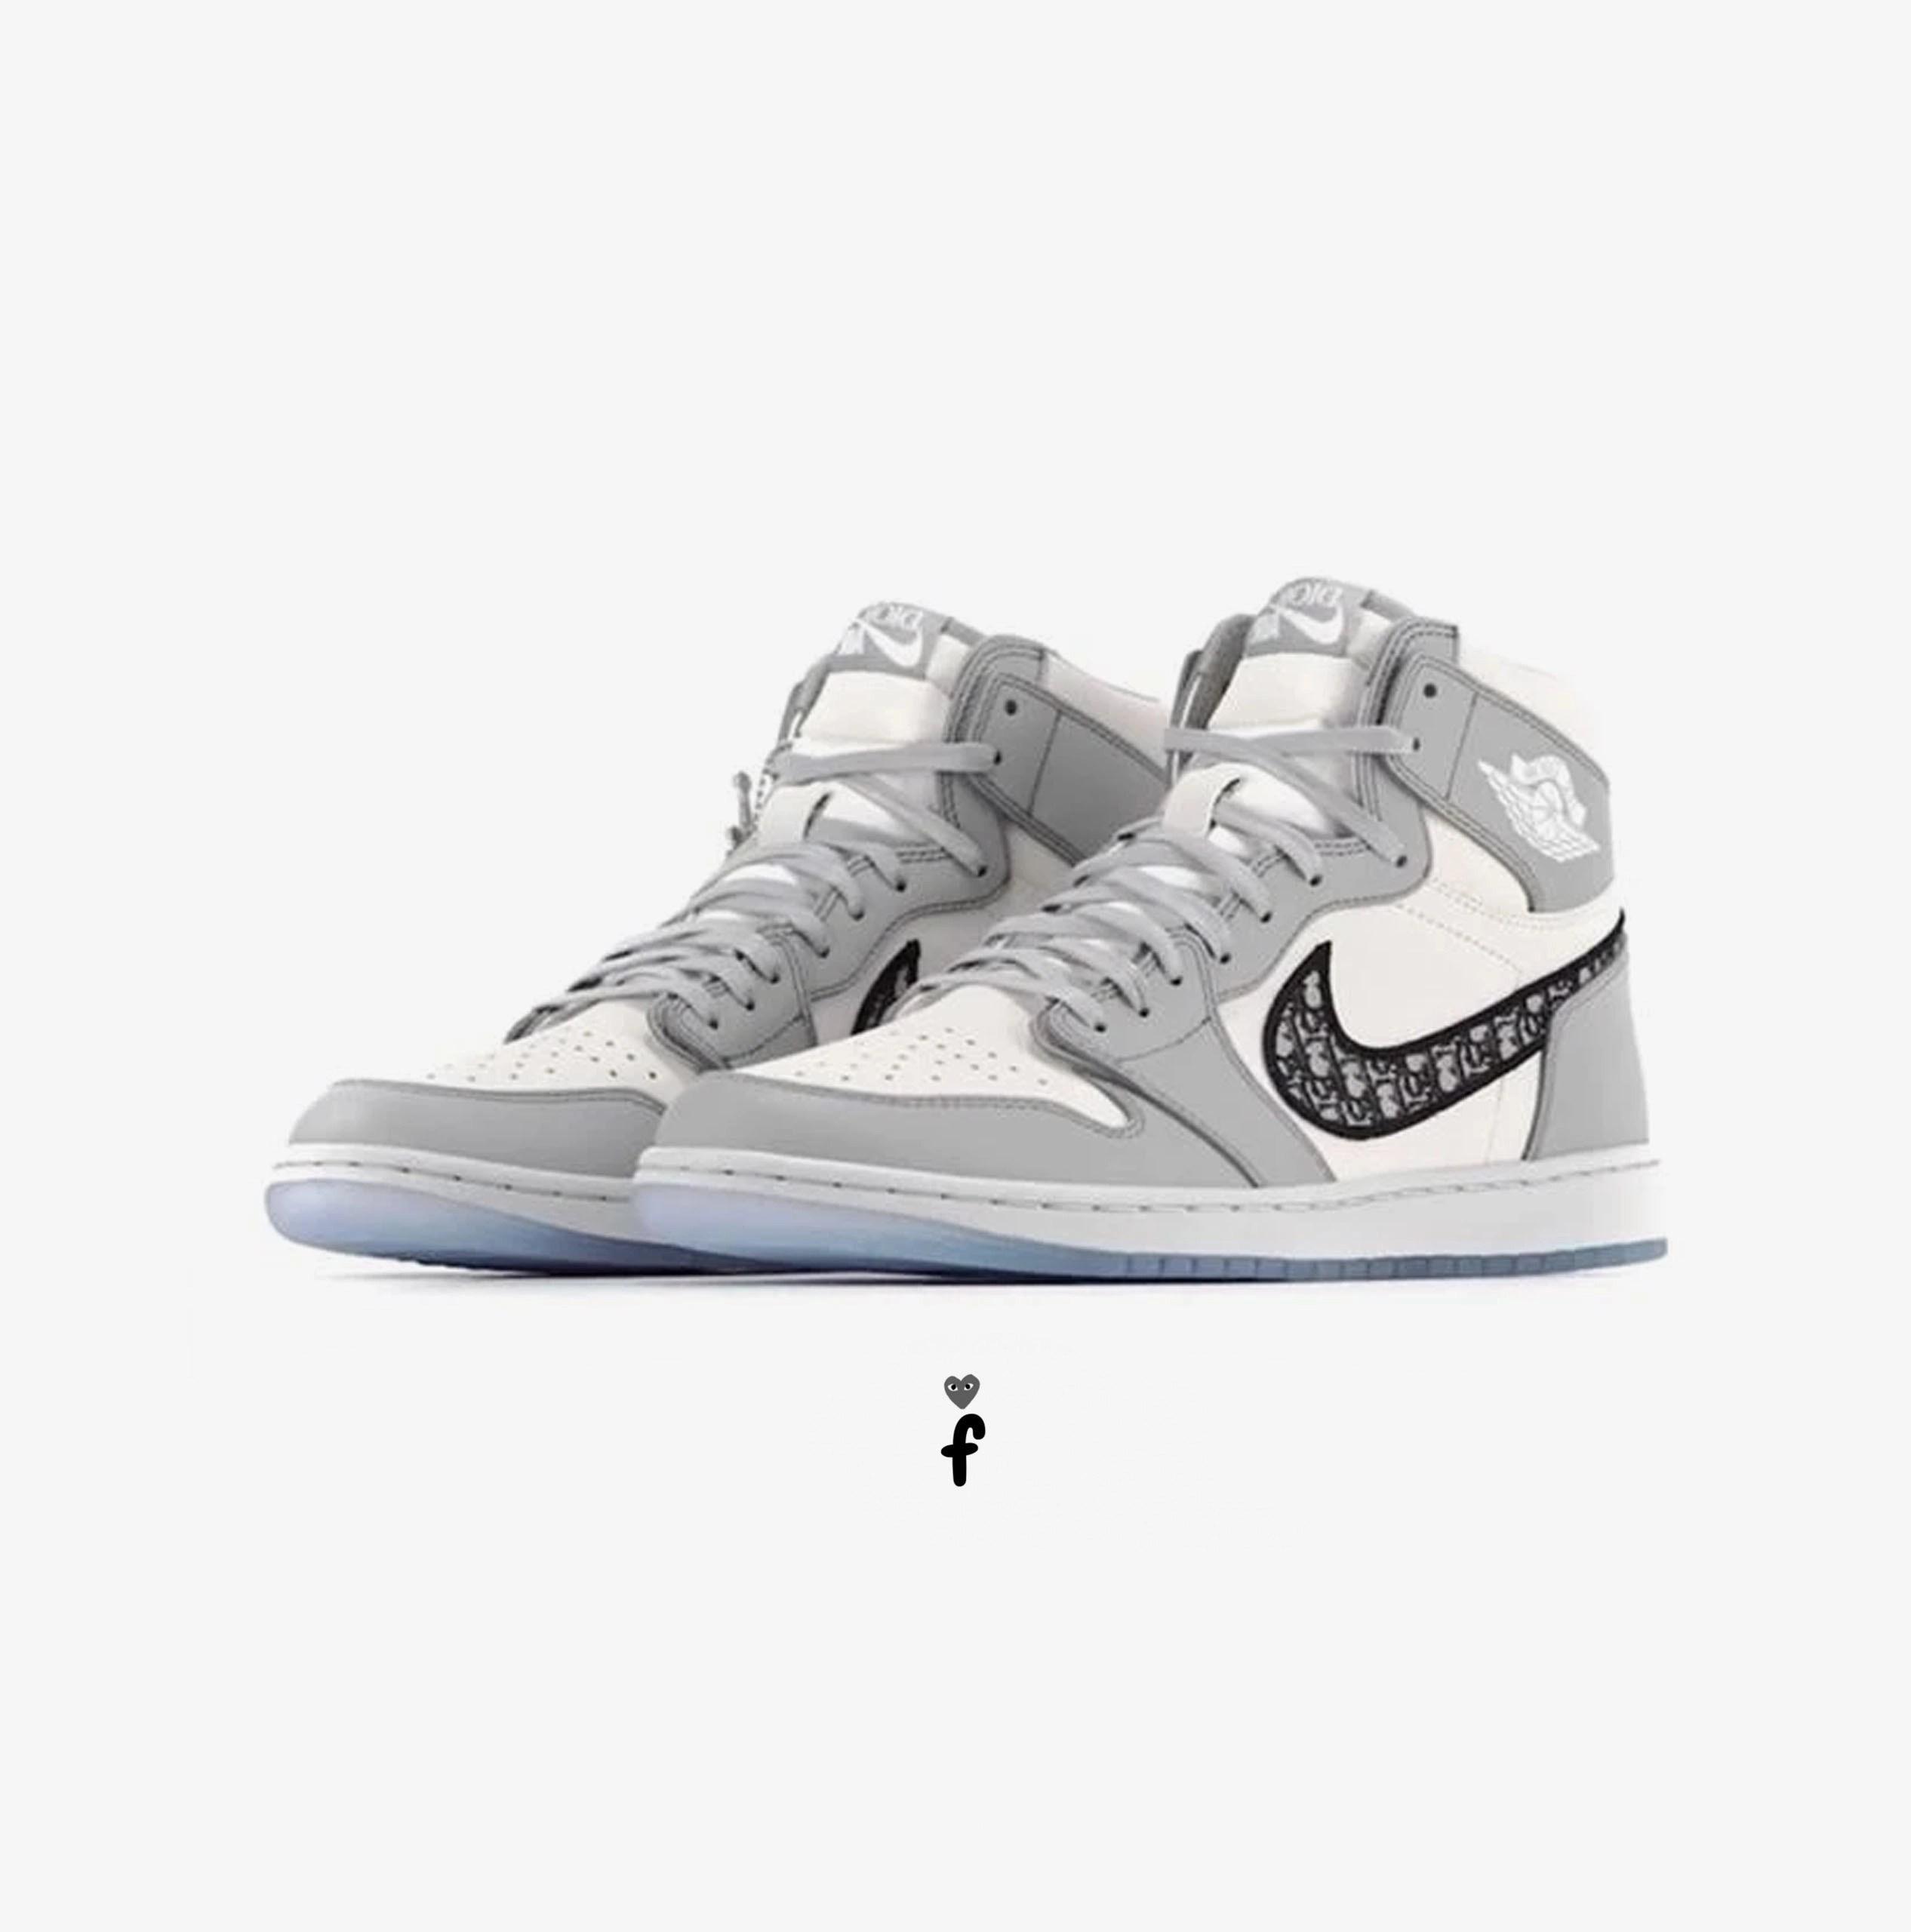 escucho música estéreo Frustración  Nike Air jordan 1 Dior 2020 comprar en Flipashops con envío gratis